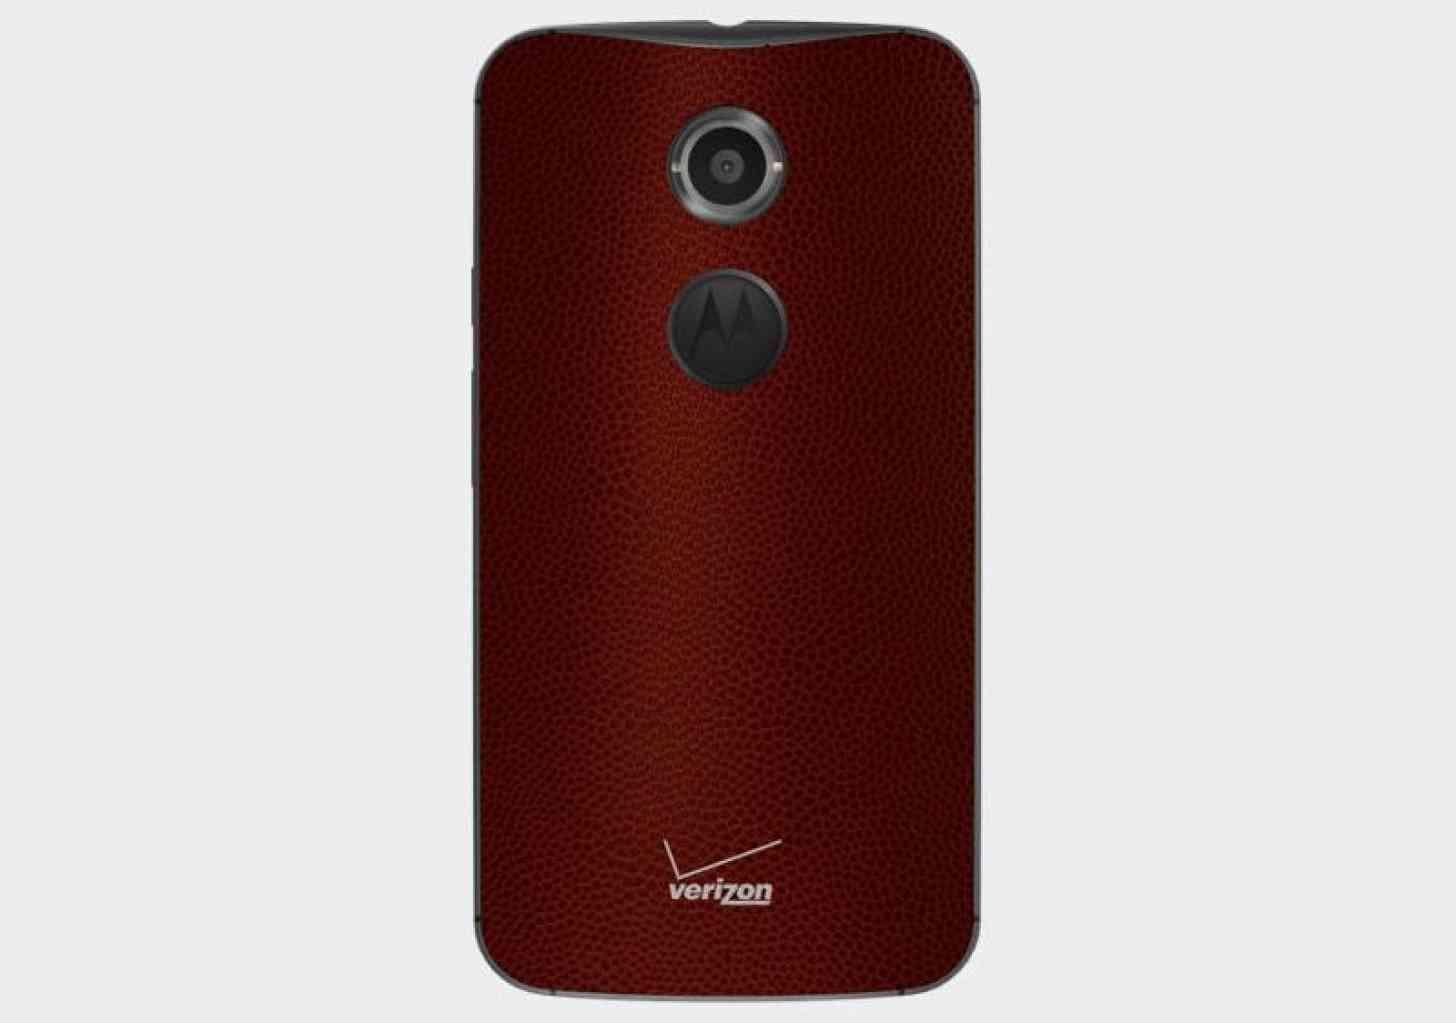 Moto X (2nd Gen.) football leather Verizon